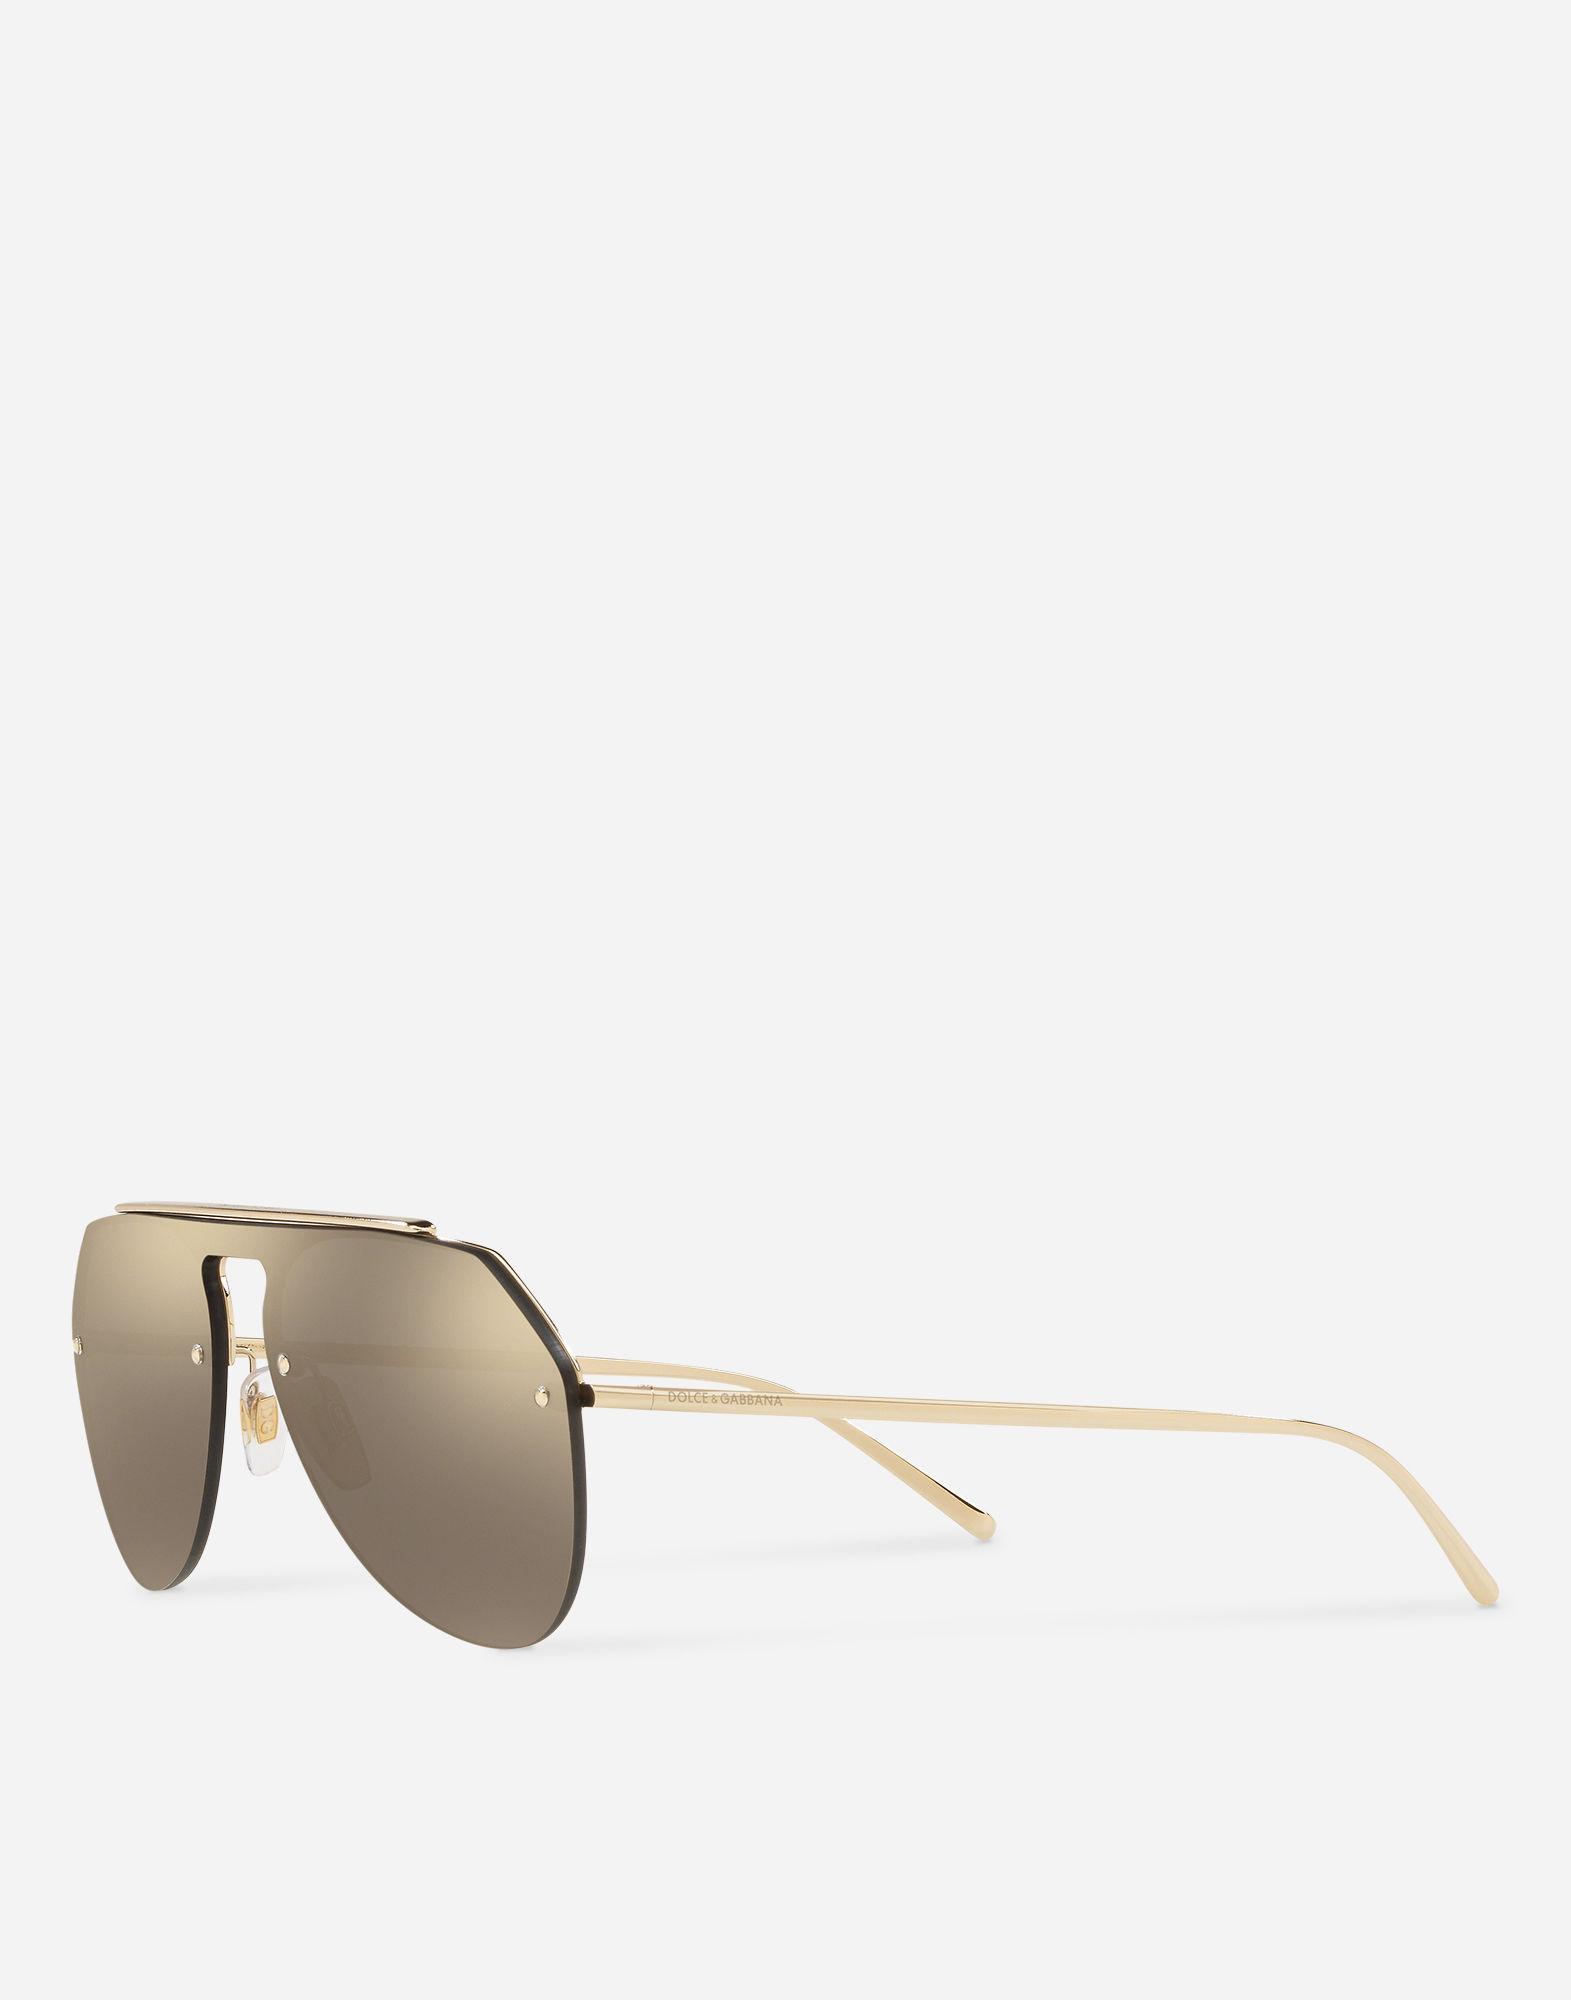 7781baf53544 Lyst - Dolce   Gabbana Royal Sunglasses in Metallic for Men